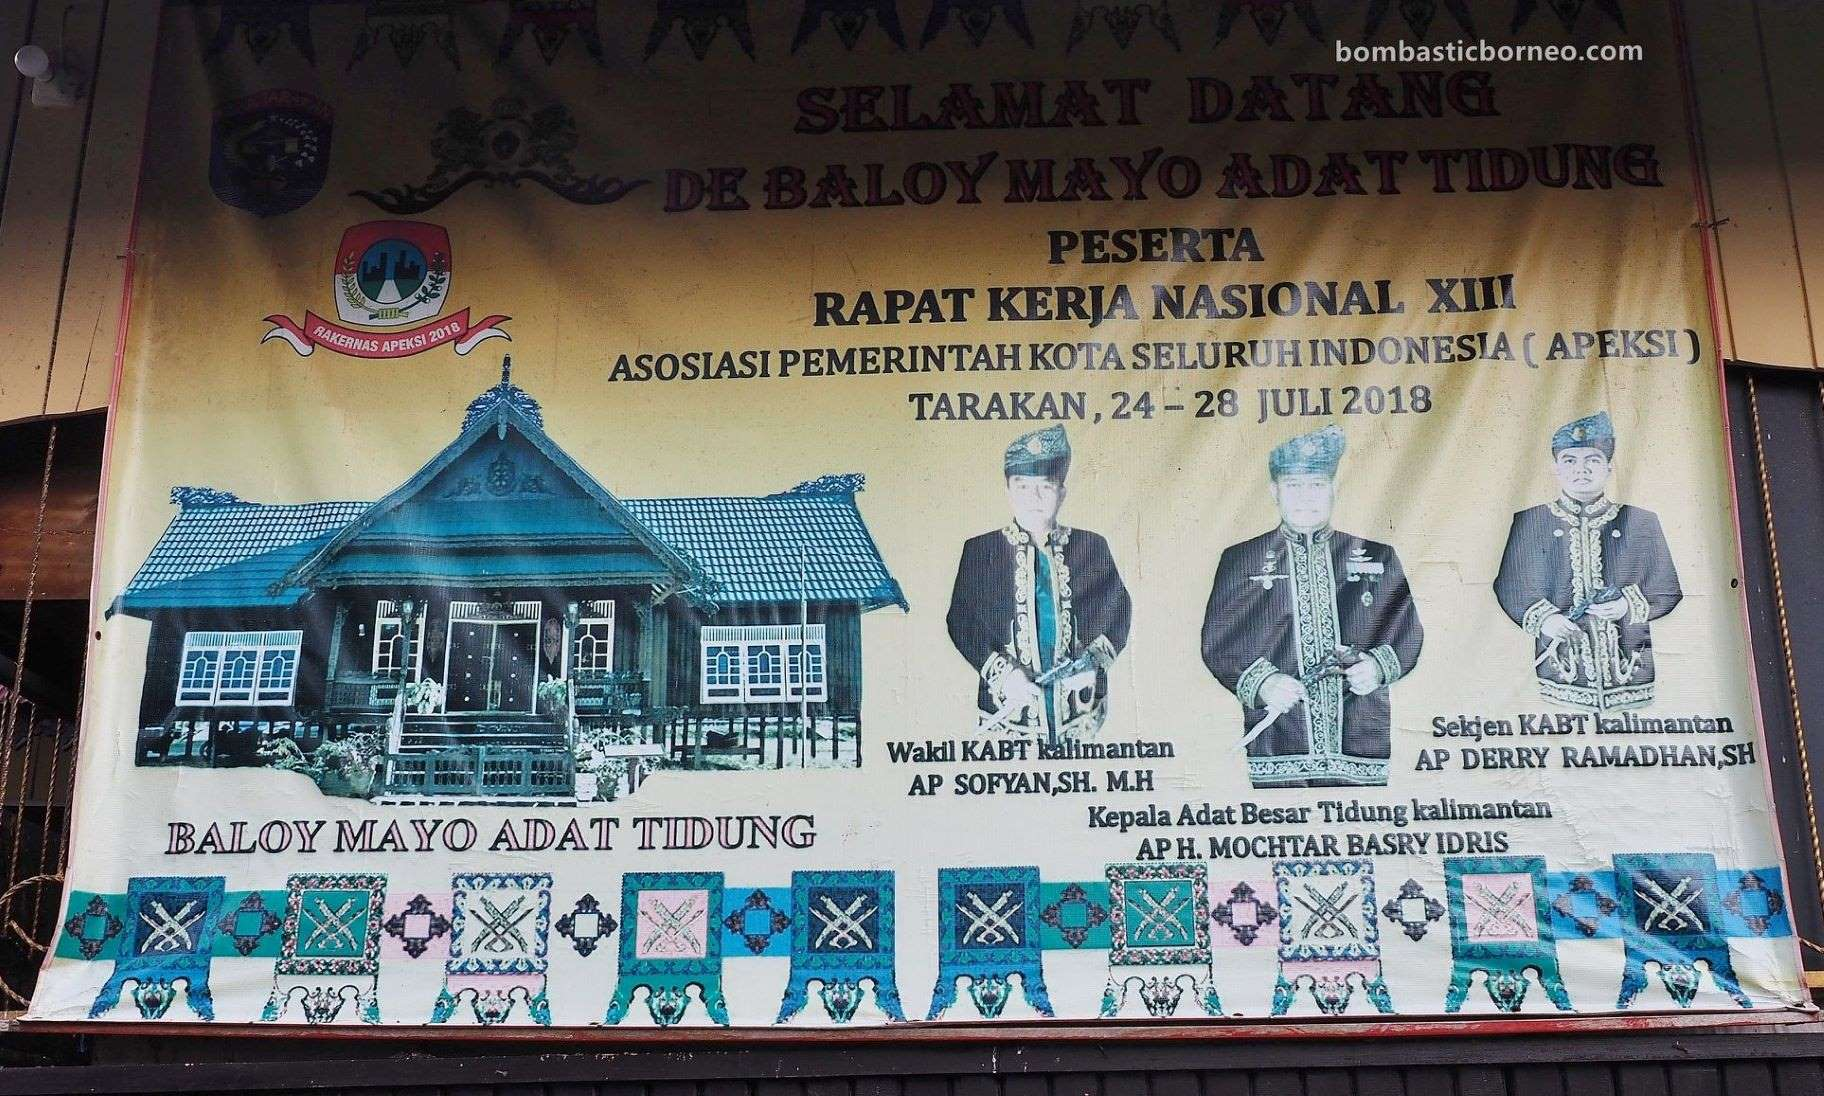 Suku Tidung House, Heritage Centre, culture, traditional, Ethnic, native, exploration, destination, Indonesia, wisata budaya, Tourism, travel guide, Borneo, 探索婆罗洲打拉根岛, 北加里曼丹旅游景点